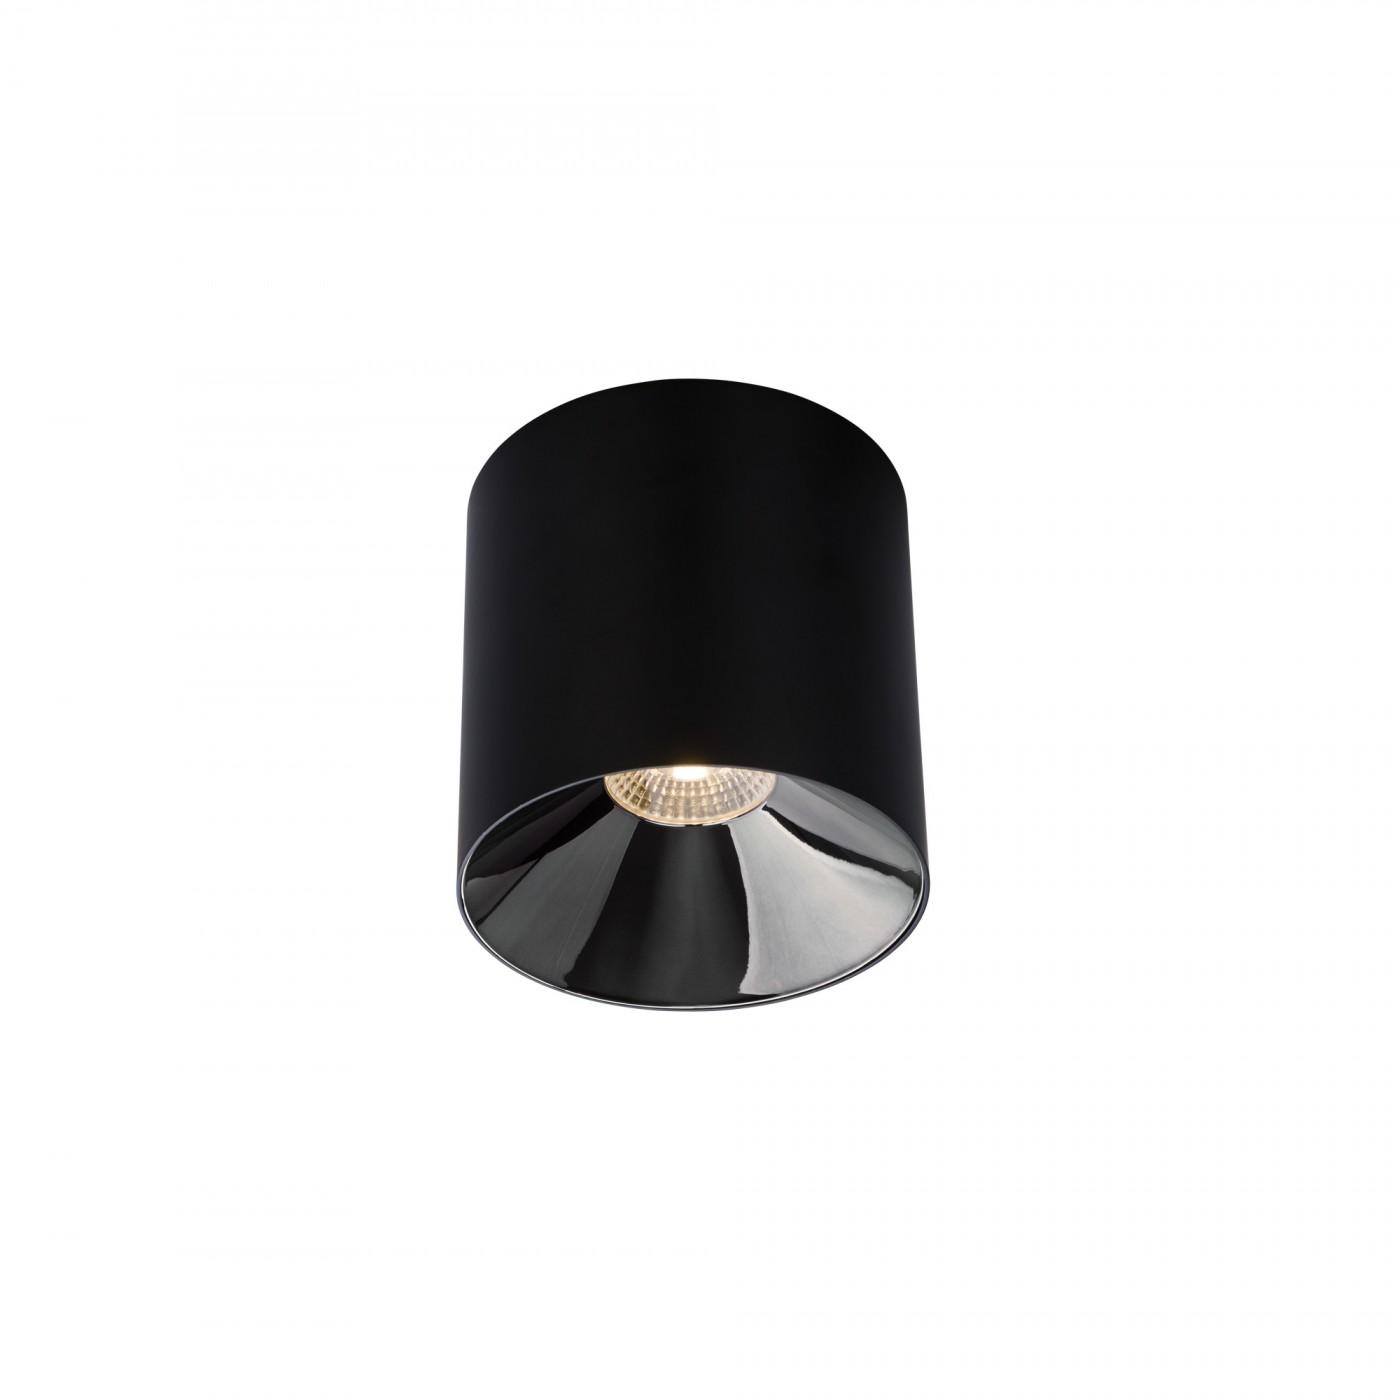 CL IOS LED 20W 4000K black 8741 Nowodvorski Lighting